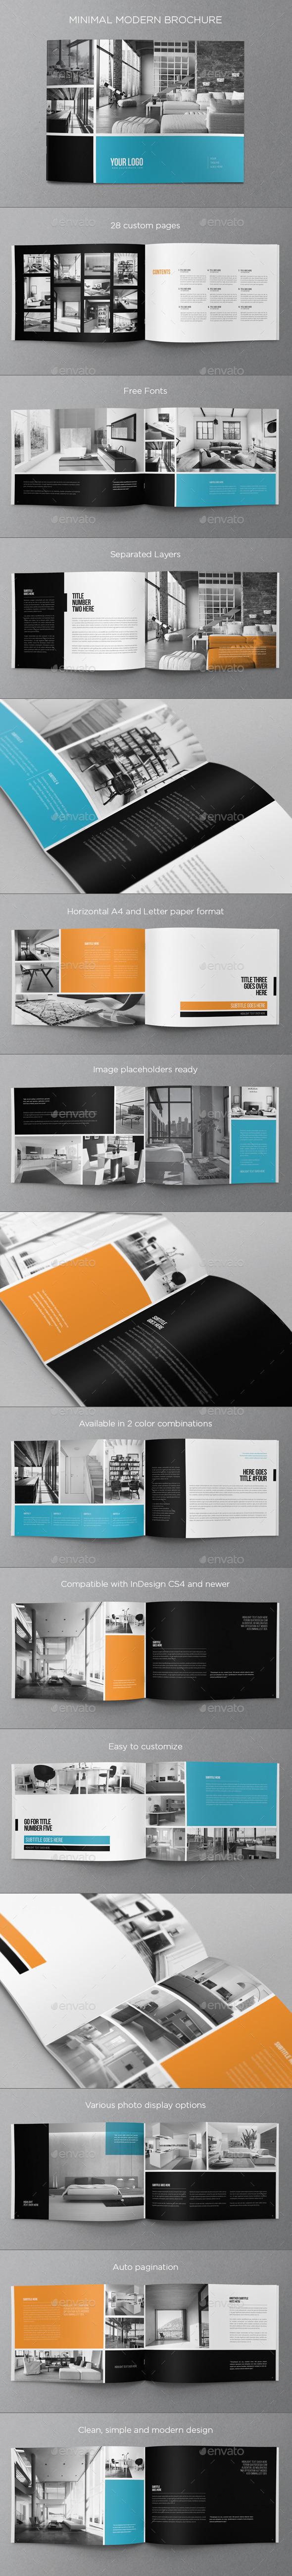 GraphicRiver Minimal Modern Brochure 8819275